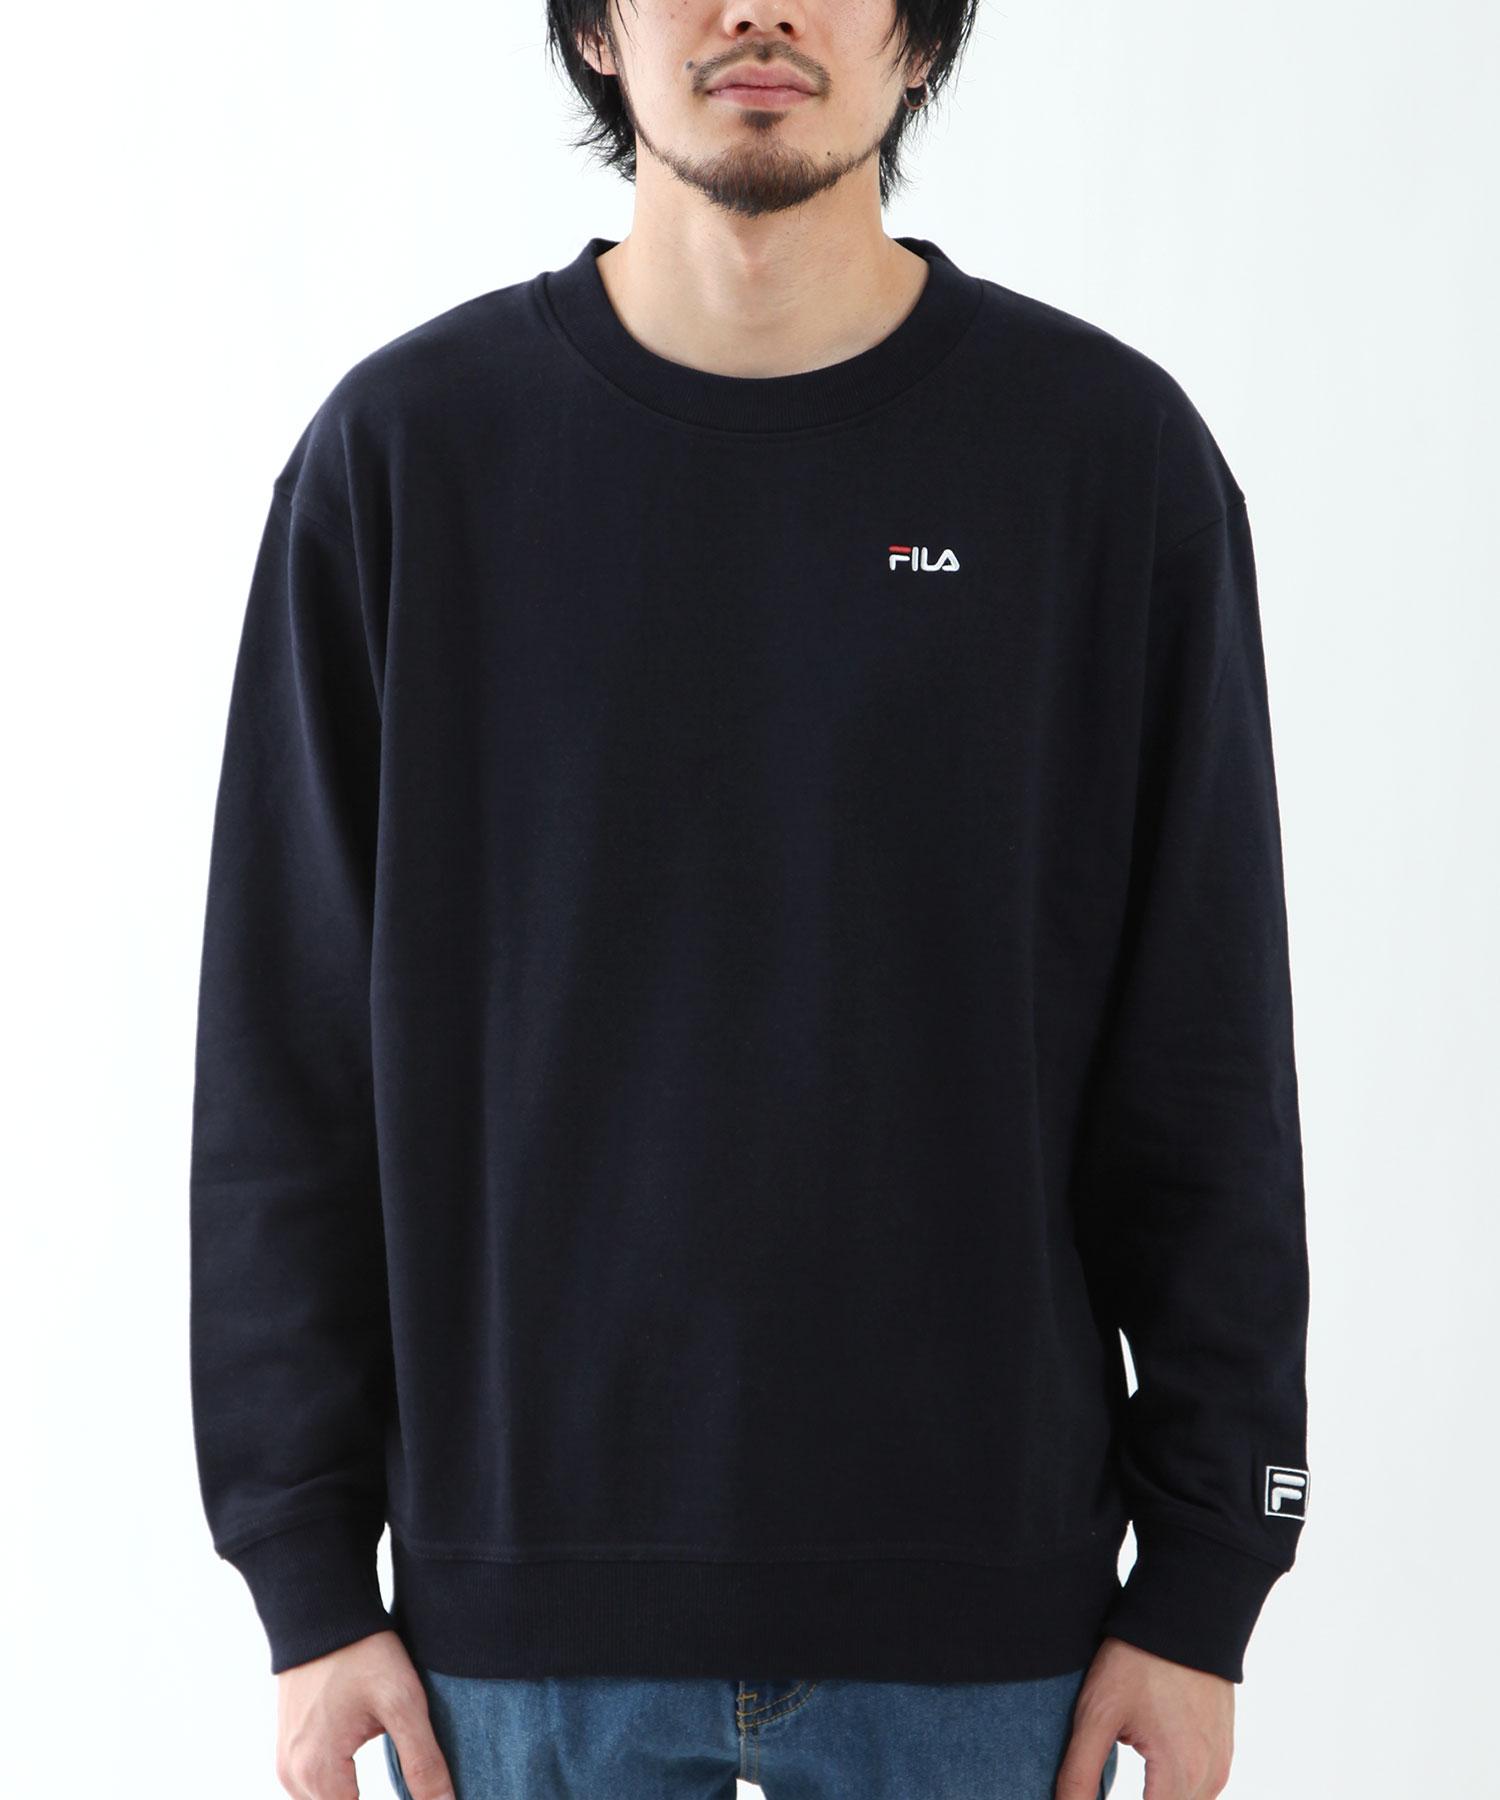 【FILA】LOGO刺繡運動衫 5